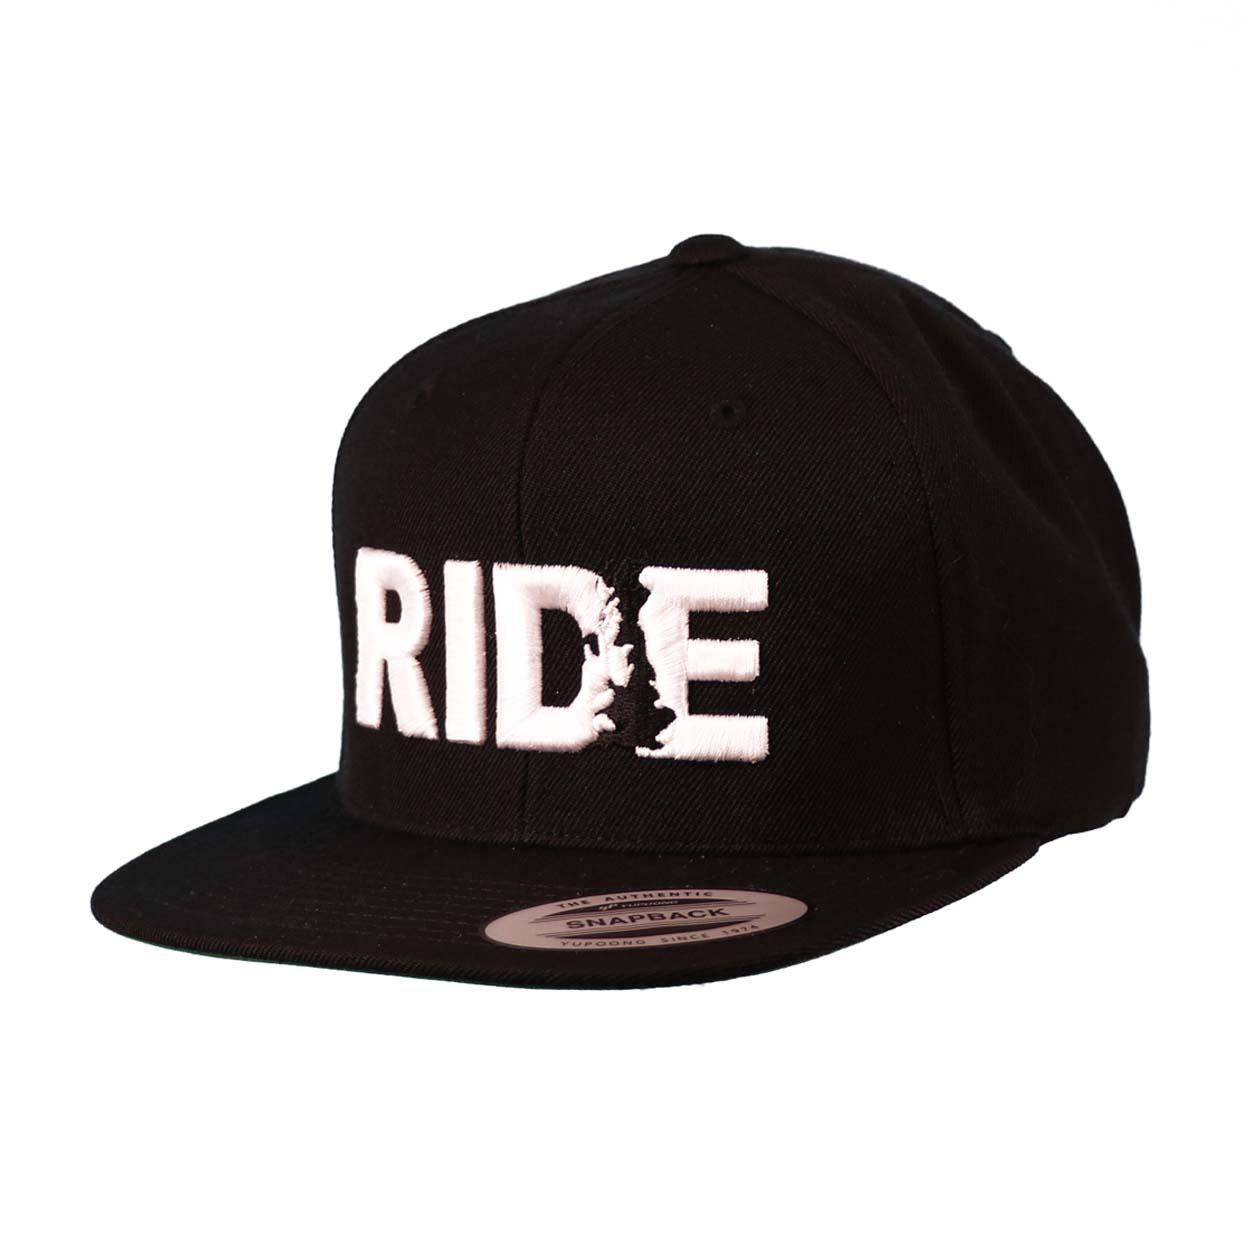 Ride United Kingdom Classic Embroidered Snapback Flat Brim Hat Black/White